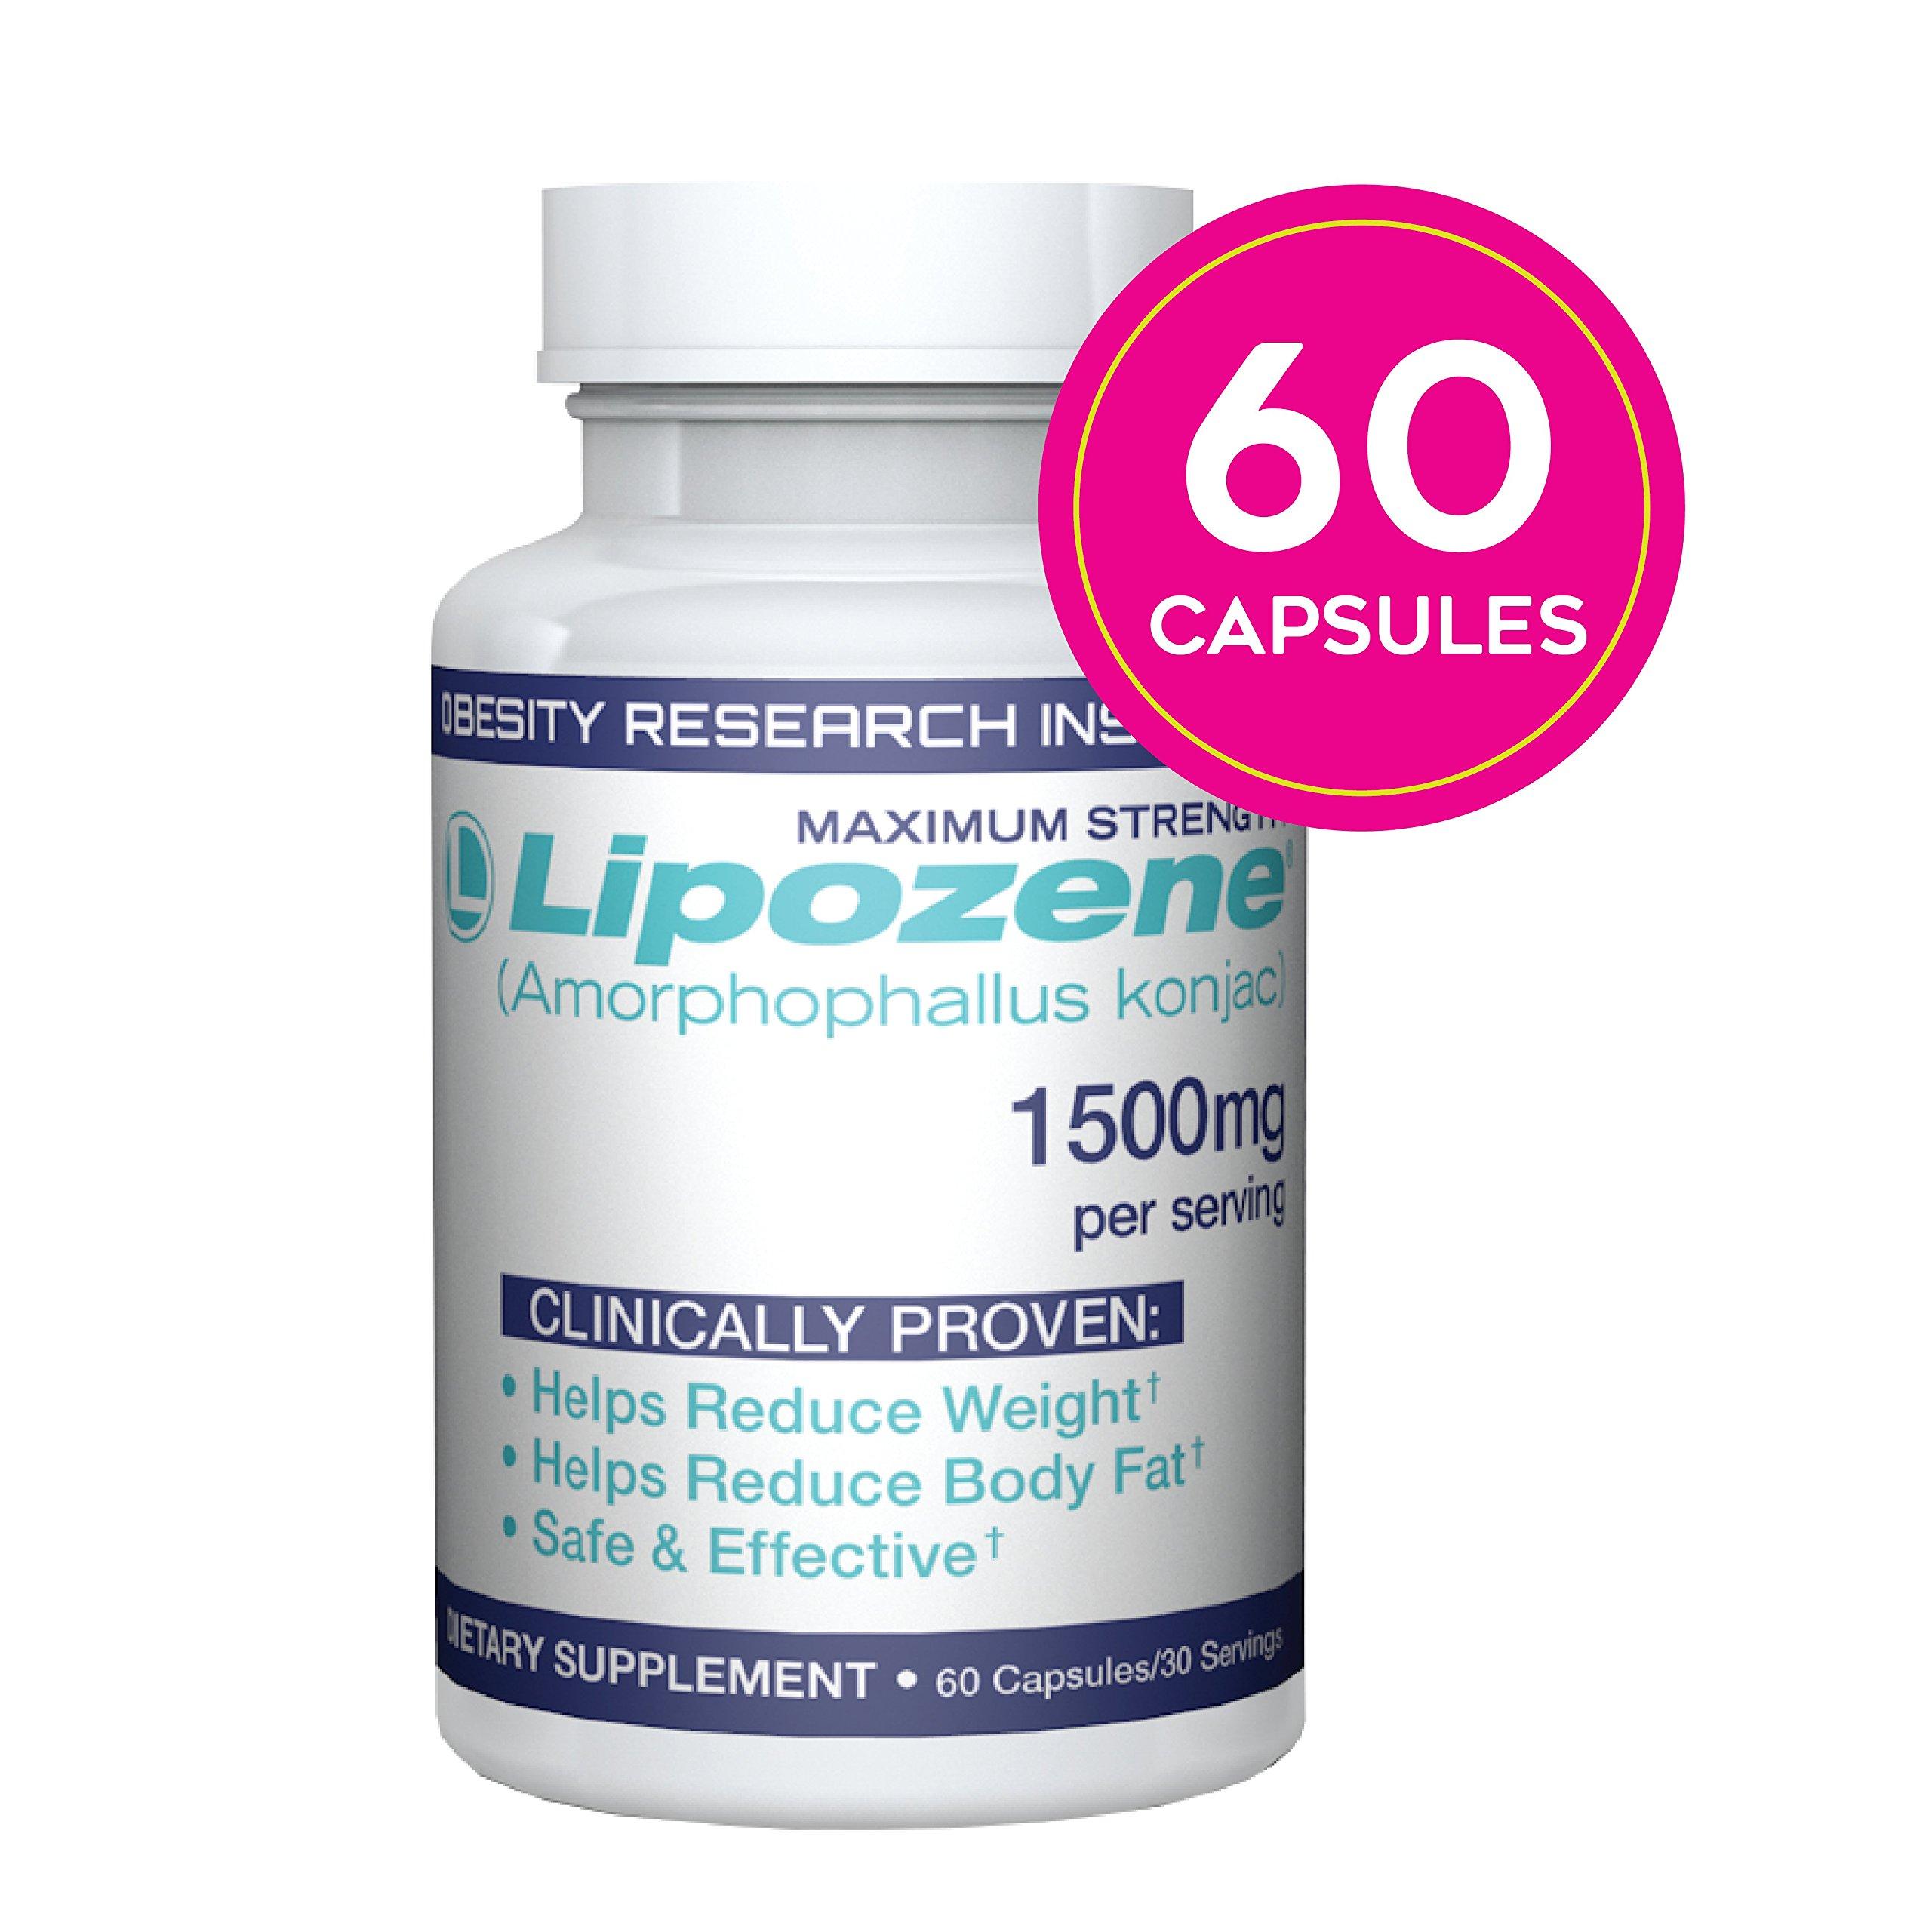 Lipozene Diet Pills - Weight Loss Supplement - Appetite Suppressant and Control - 60 Capsules - No Stimulants No Jitters by Lipozene